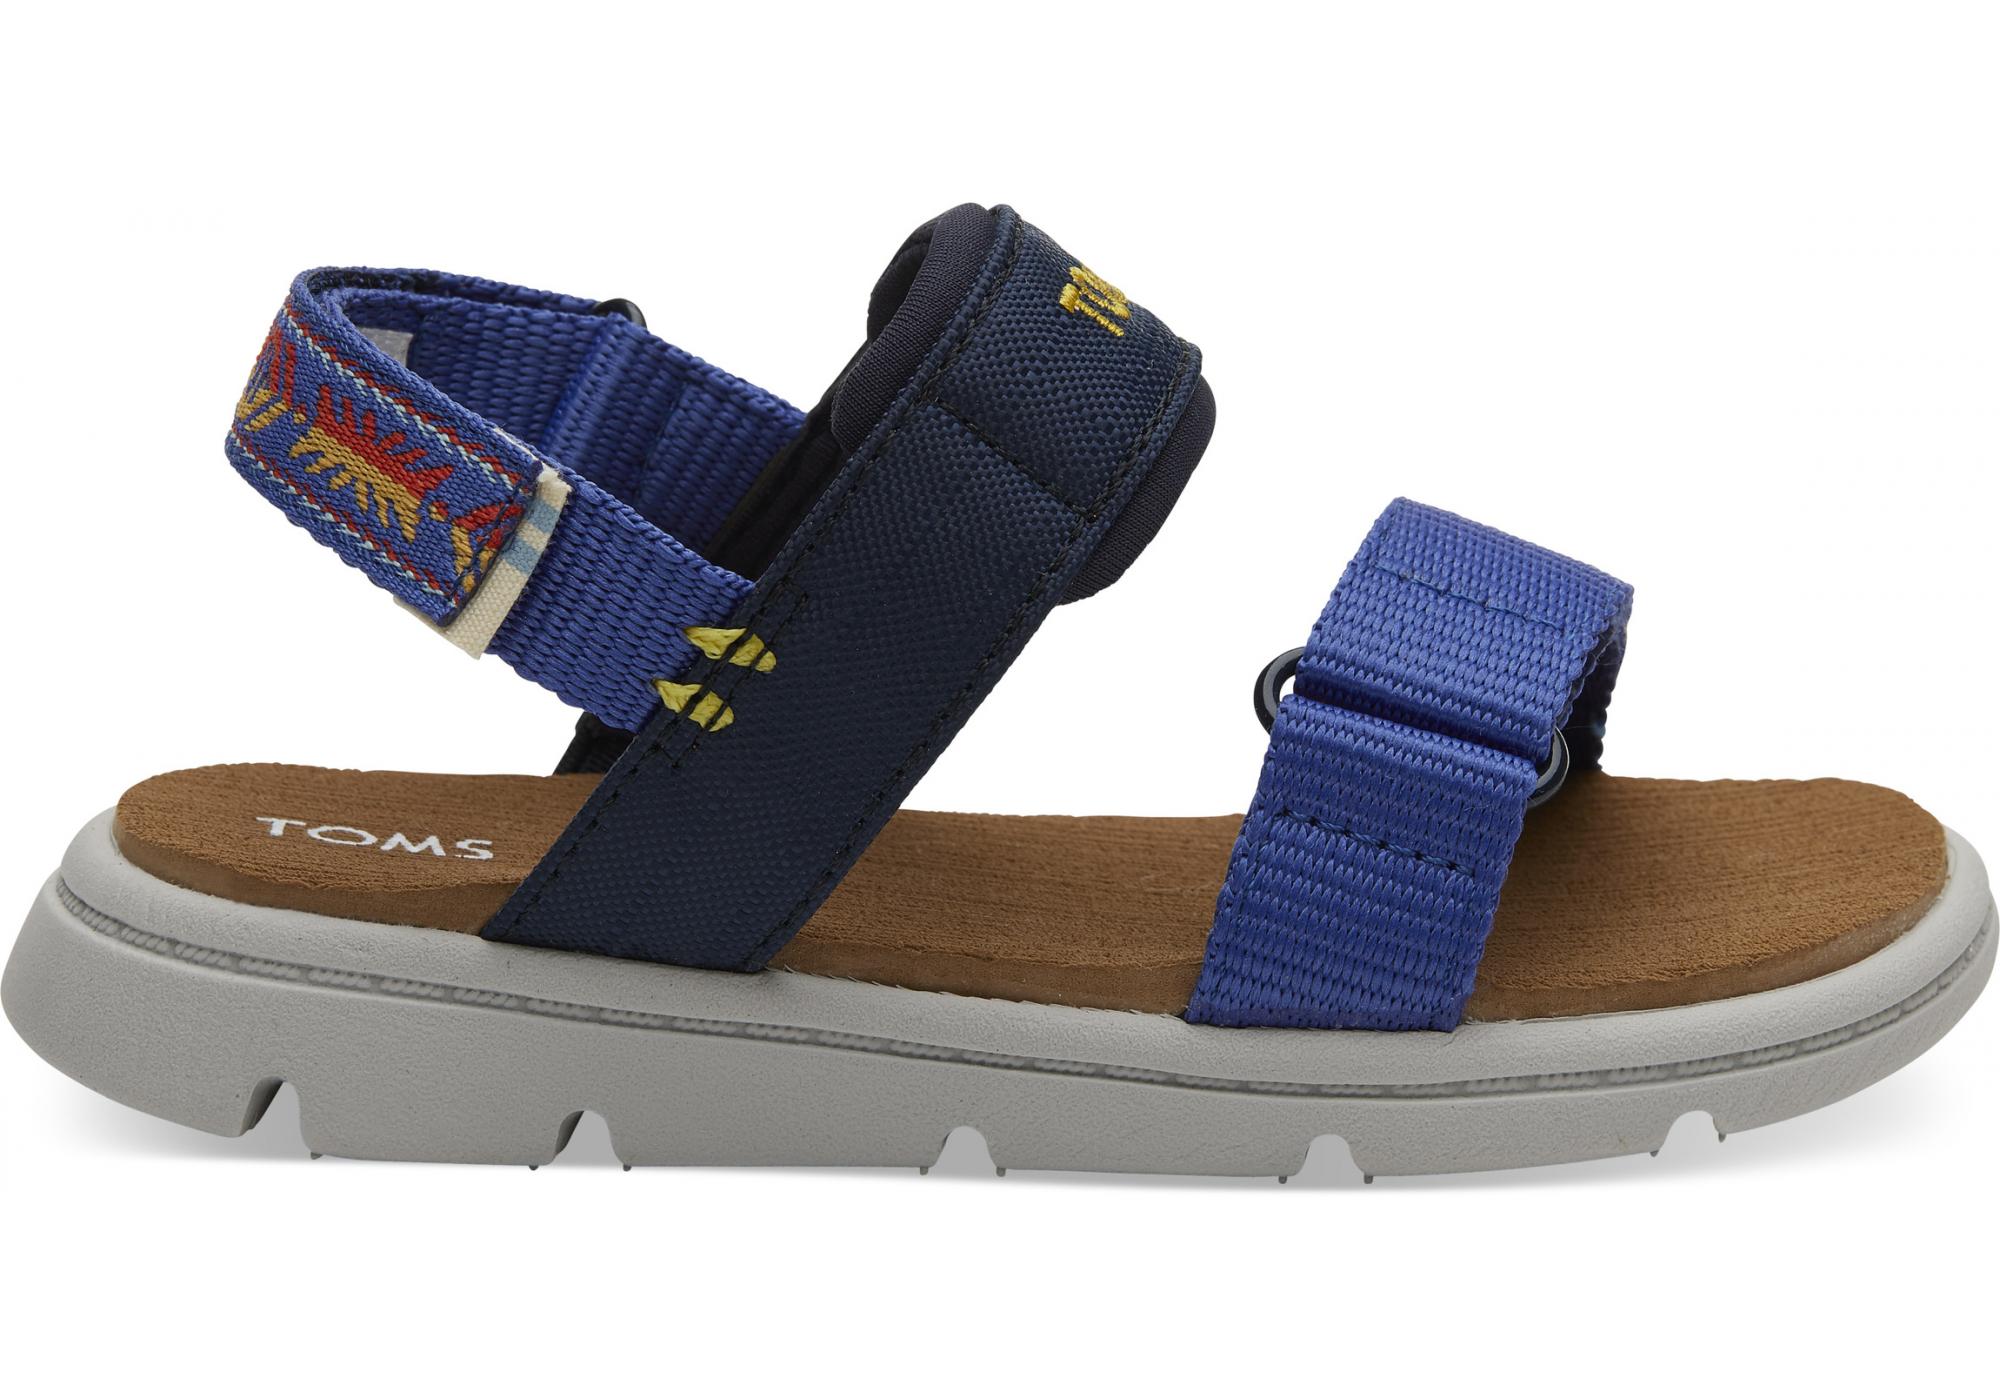 e1d3fb628fdc0 URBANLUX | Dětské modré sandálky TOMS Tiny Ray Sandals